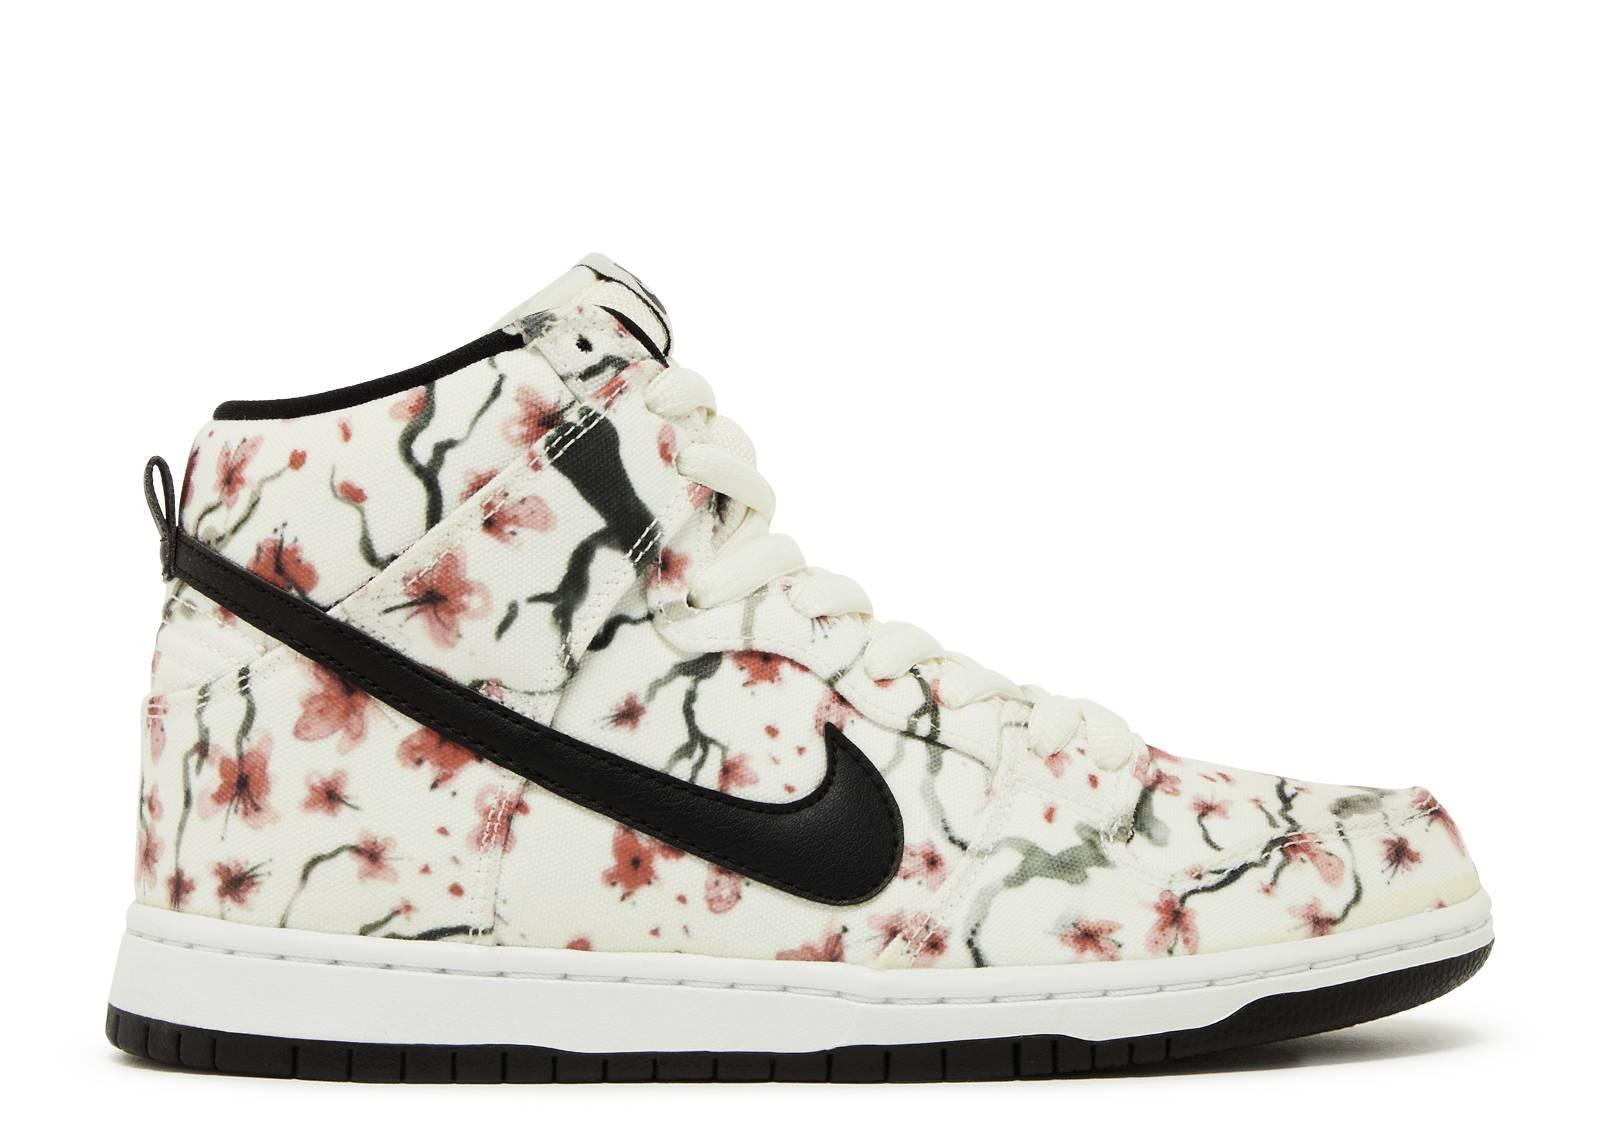 Nike Dunk Salut Pro Sb Fleur De Cerisier browse jeu réduction profiter FEE9EYSra0